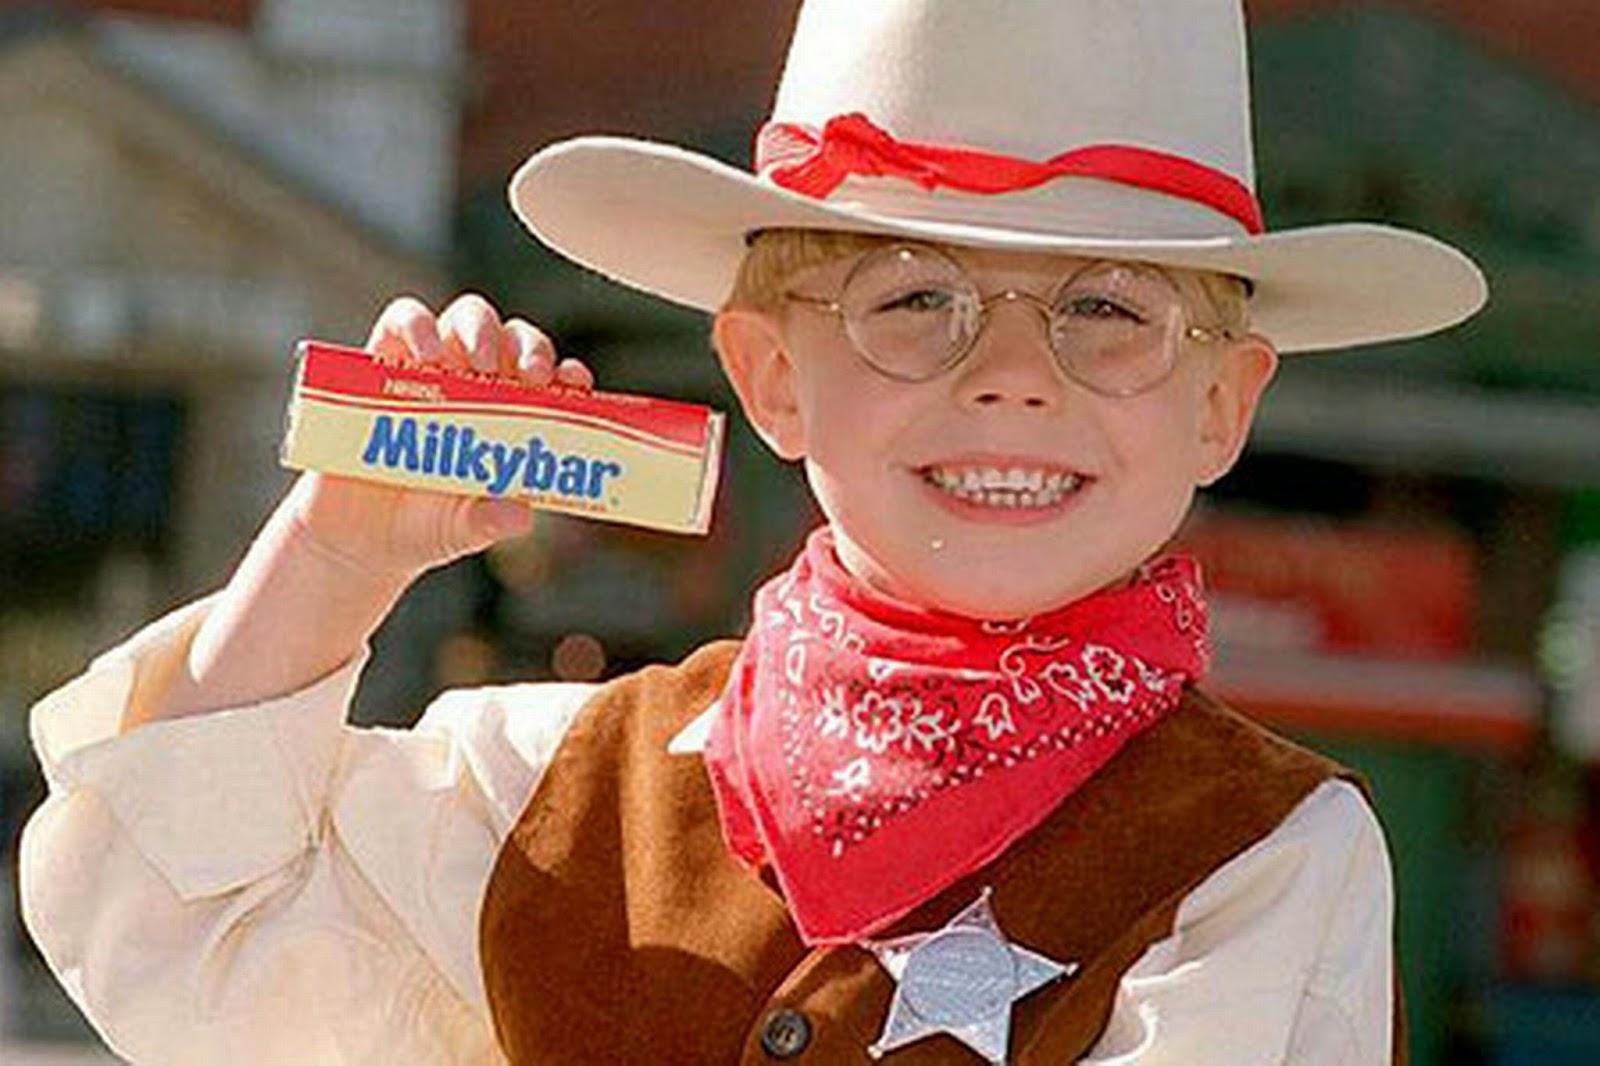 Milkybar kid